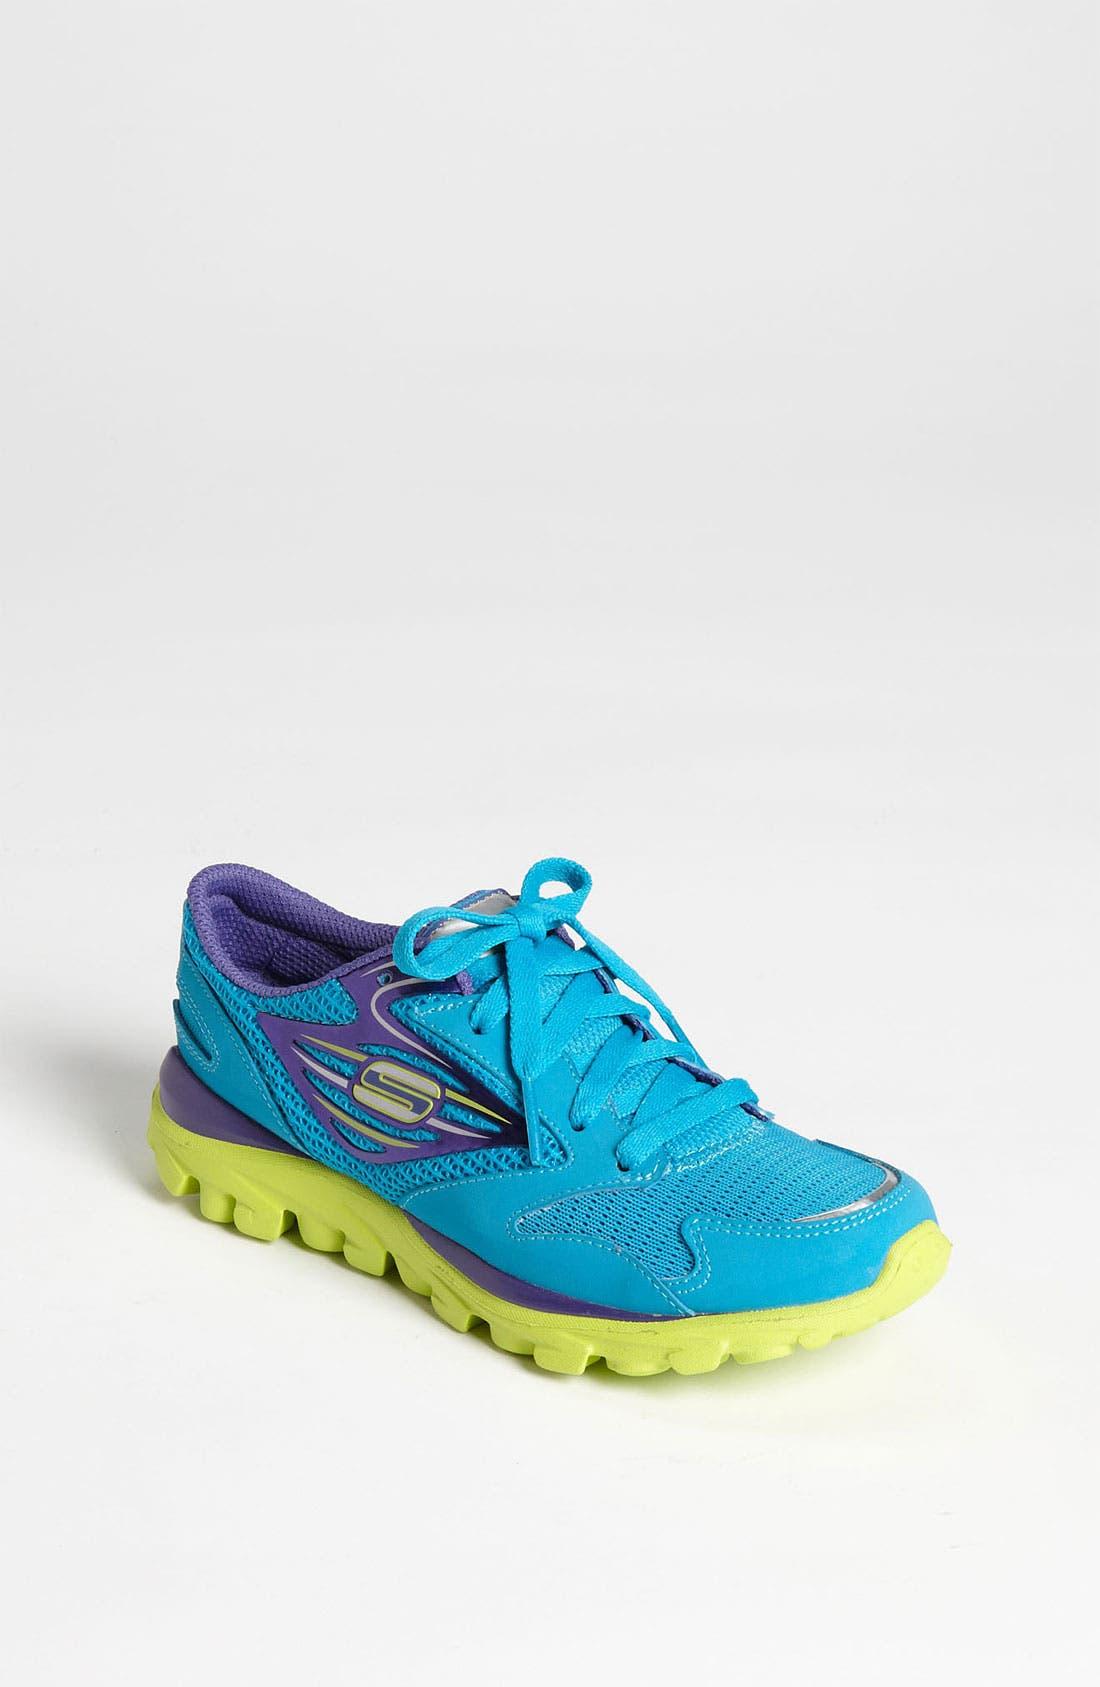 Alternate Image 1 Selected - SKECHERS 'Go Run' Sneaker (Toddler, Little Kid & Big Kid)